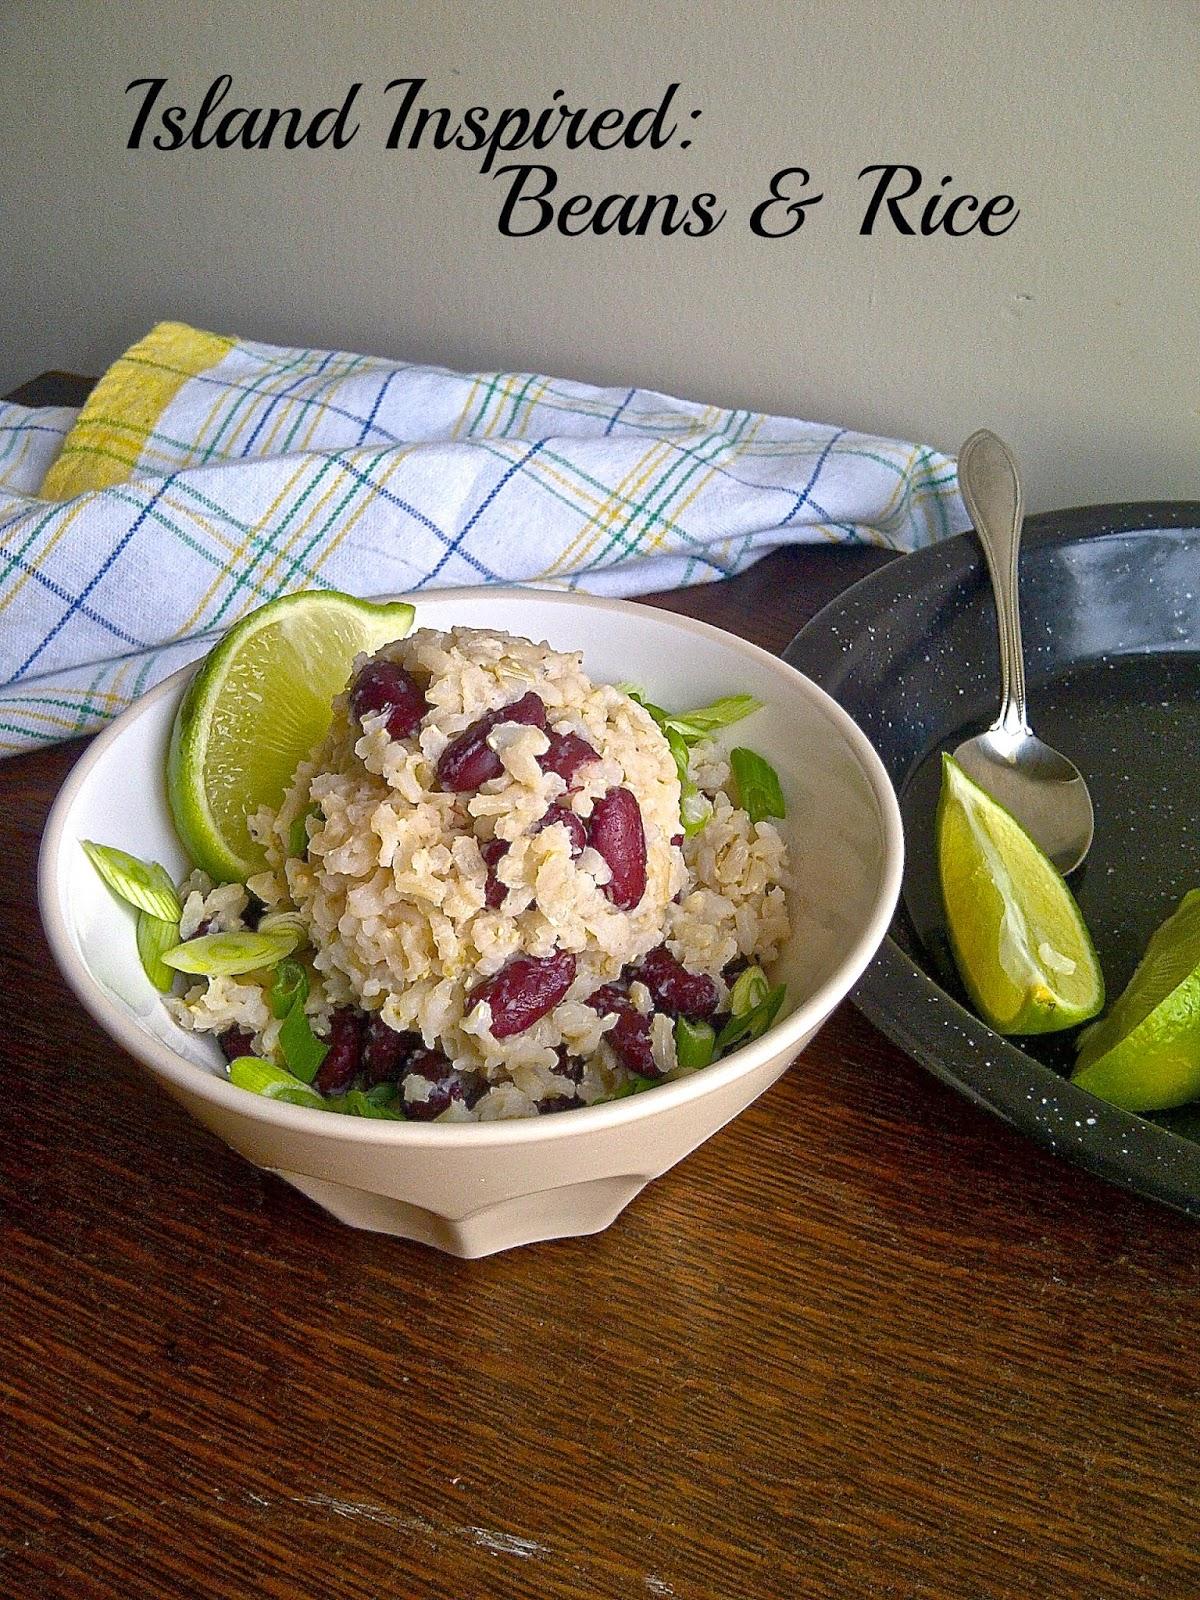 Island Inspired:  Beans & Rice